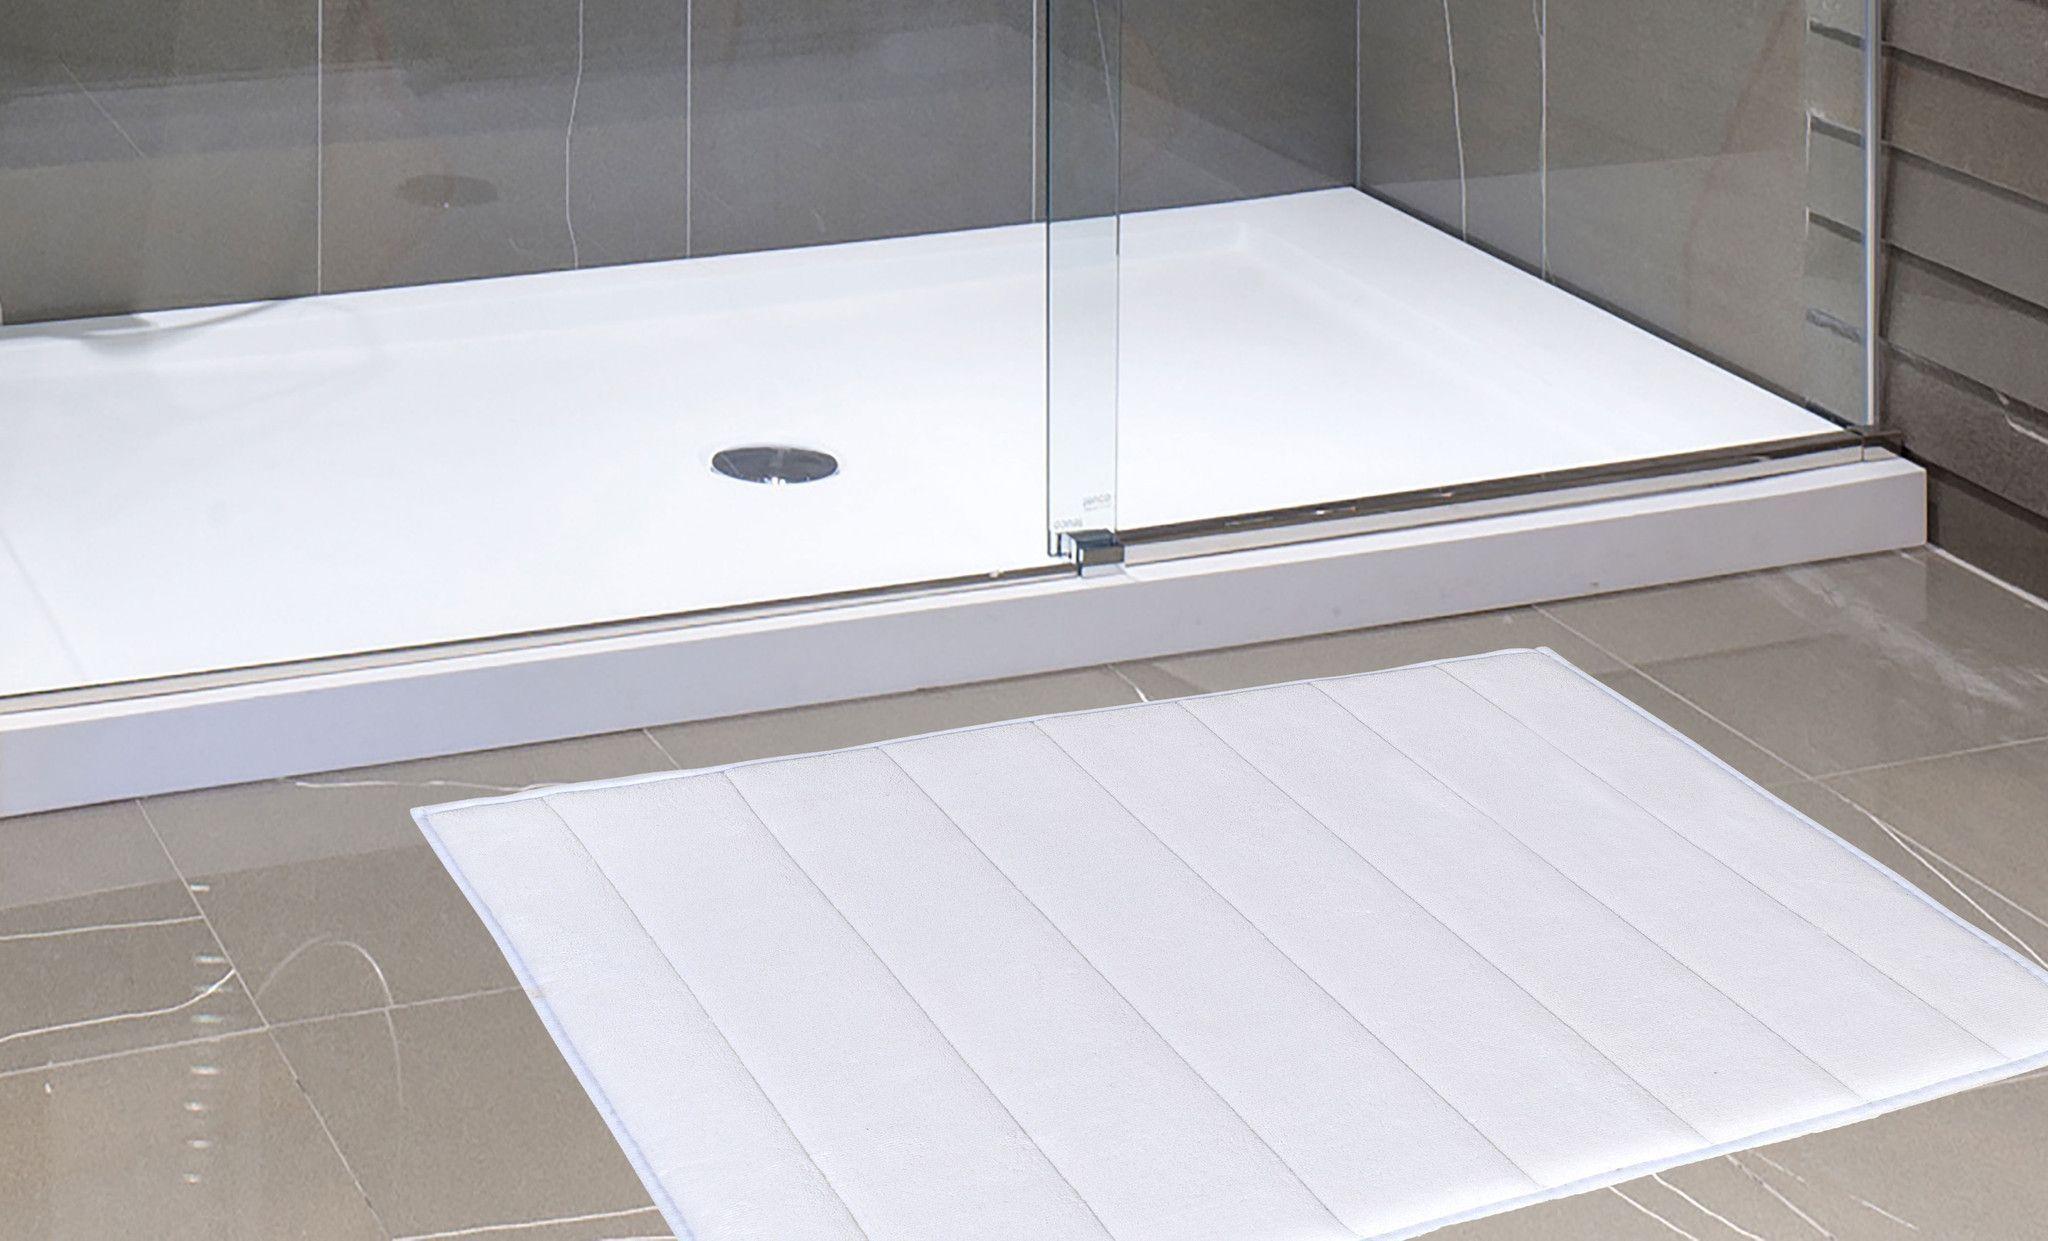 White Memory Foam Bath Mat Horizontal Striped Rug Non Slip Bath